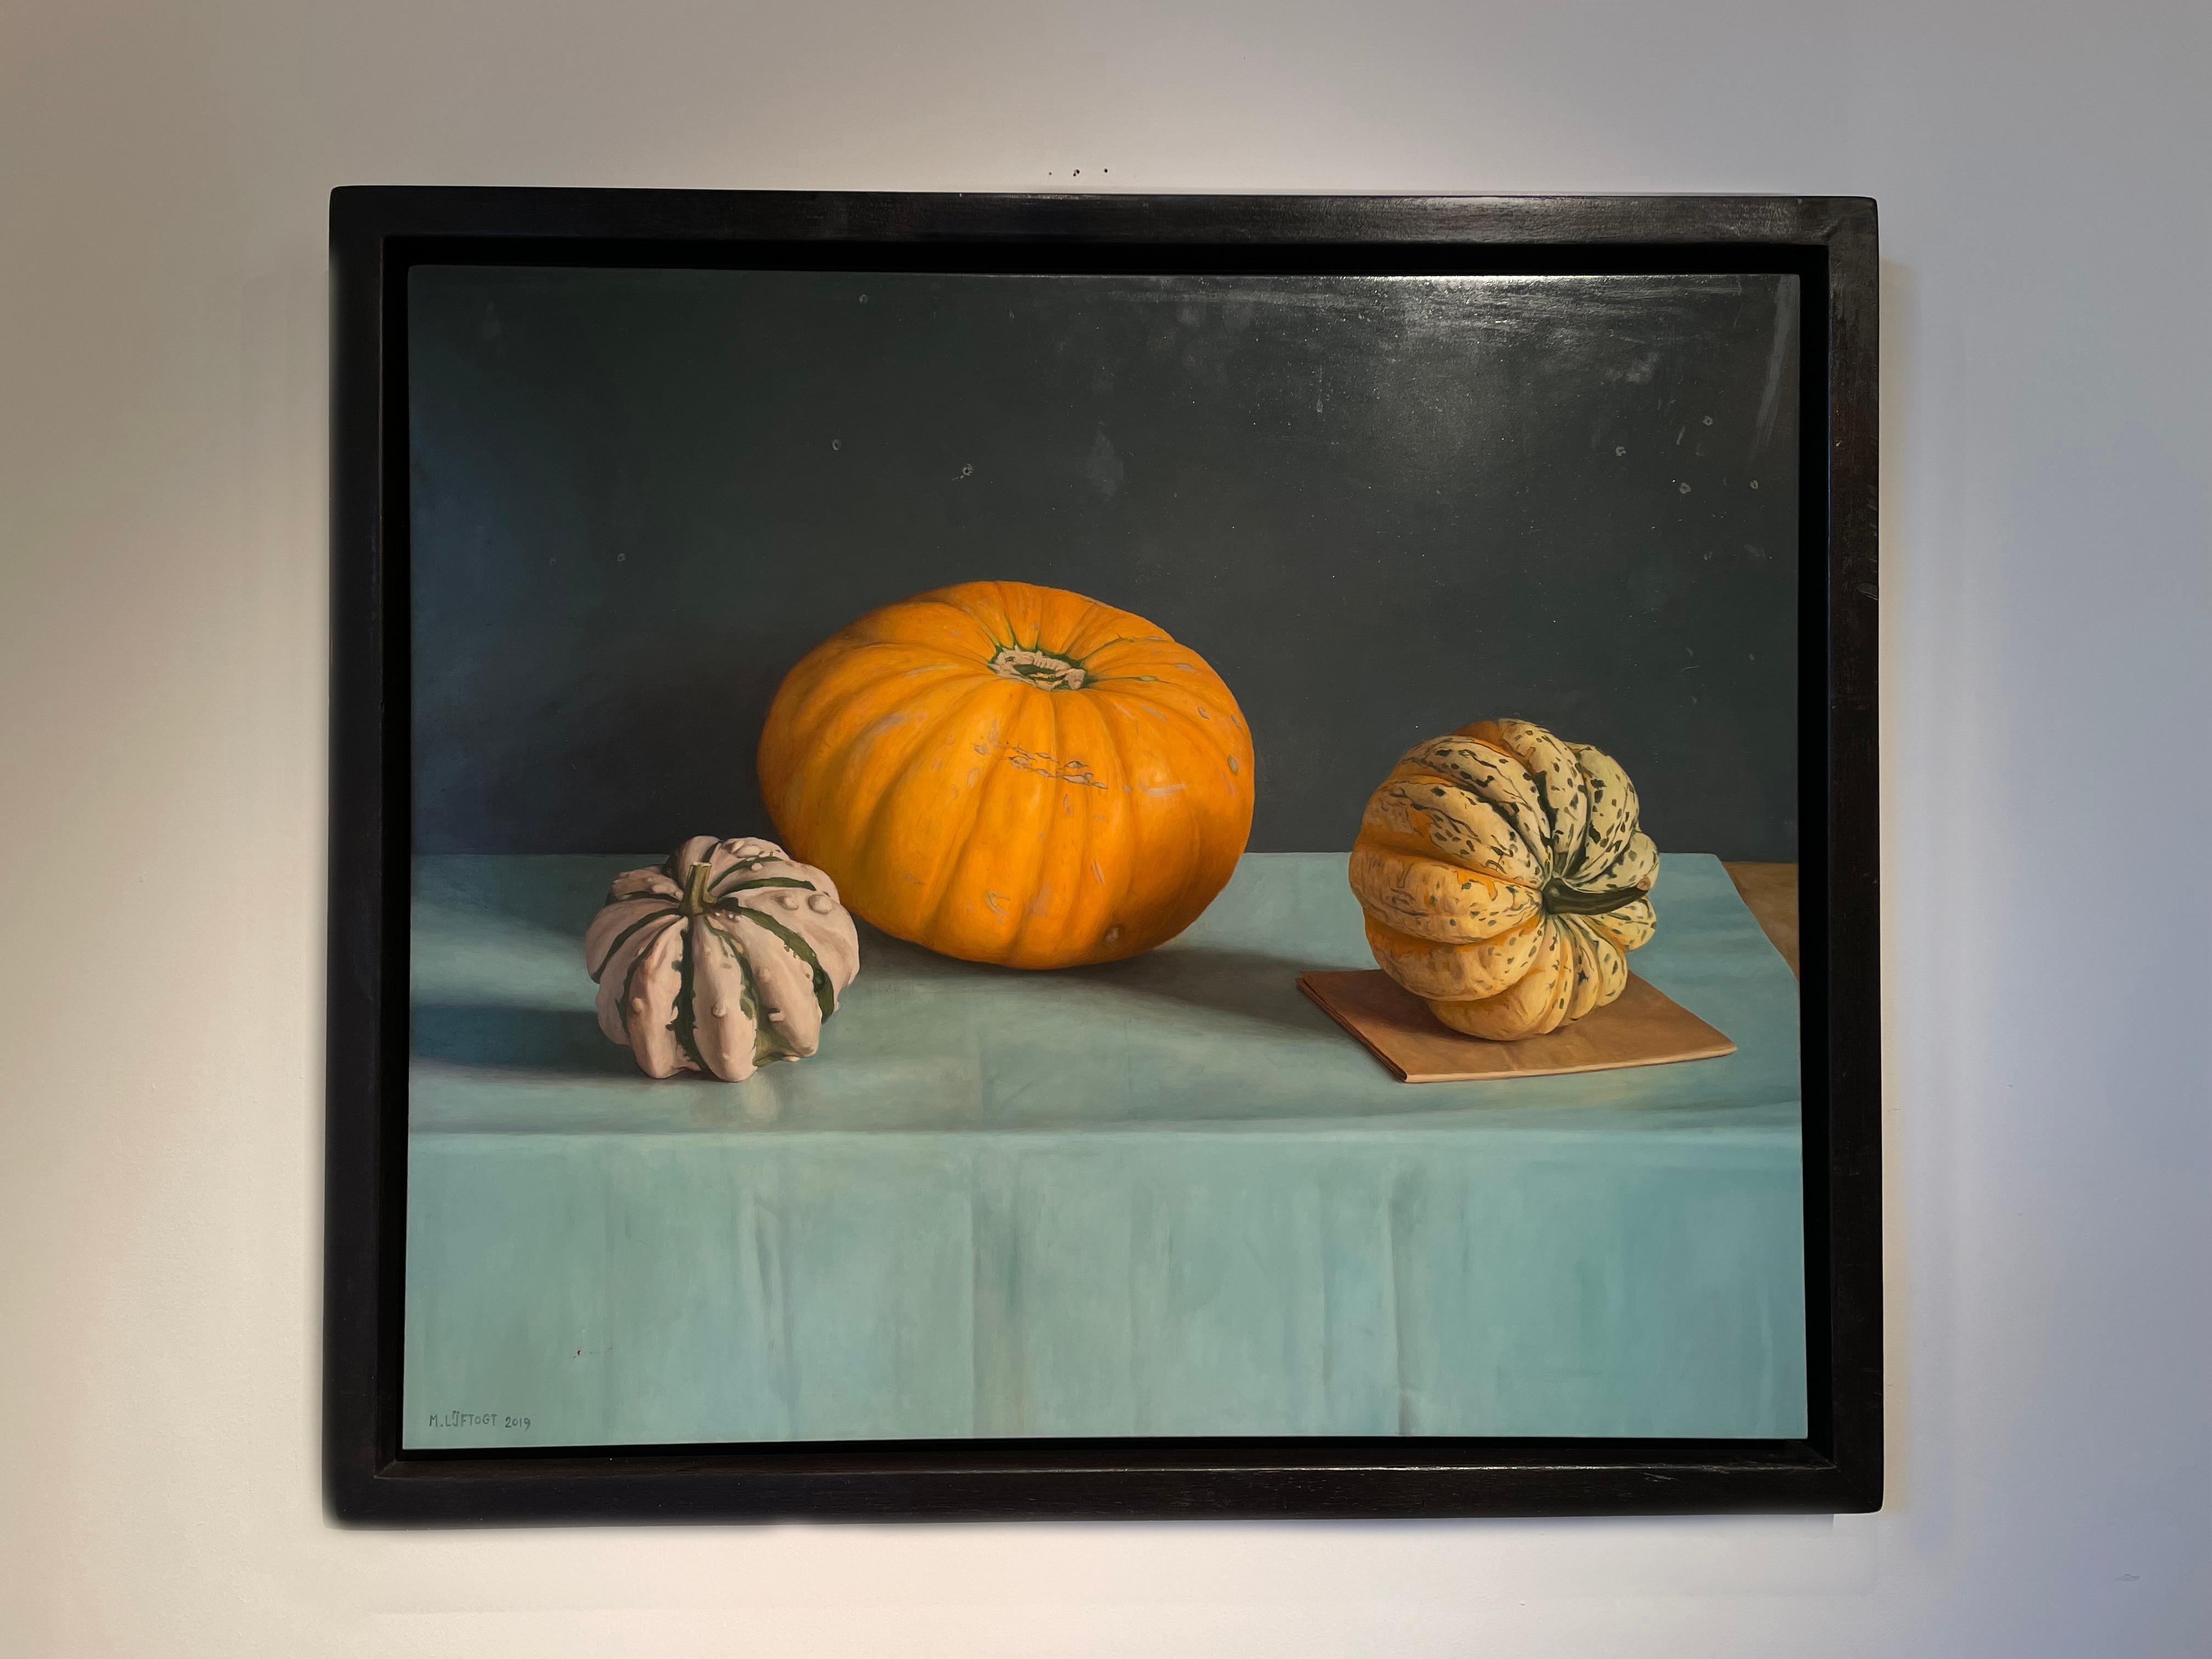 'Orange Pumpkin' Photorealist painting of pumpkins, on a blue, teal cloth